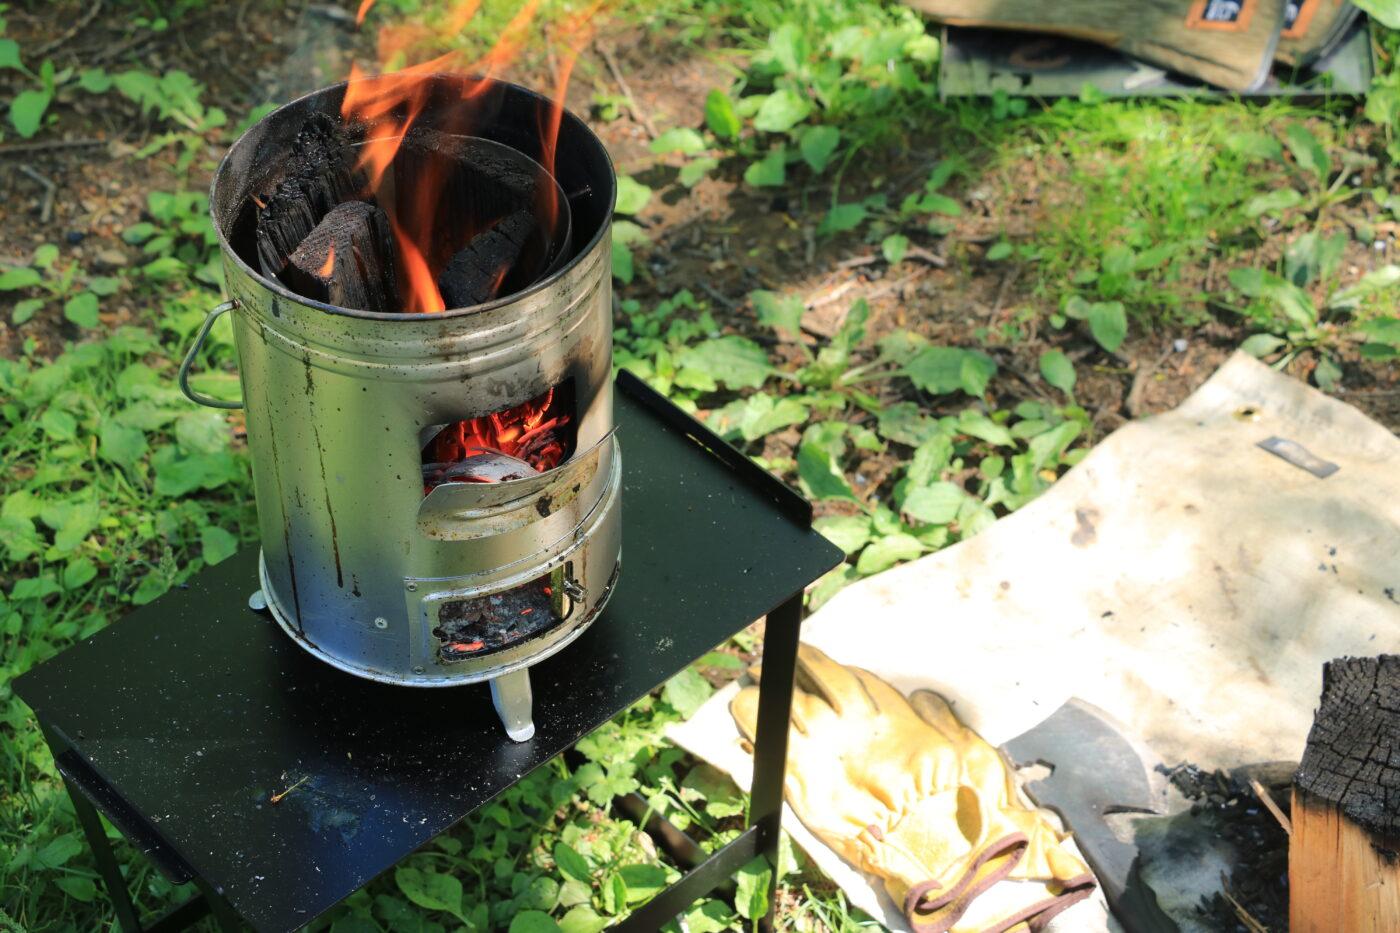 tab.マルチに使える缶ストーブは焚き火も出来る。一番下に空気の取入口があるので、燃焼効率はとても良い。縦にきれいに炎が上がるのも美しい。